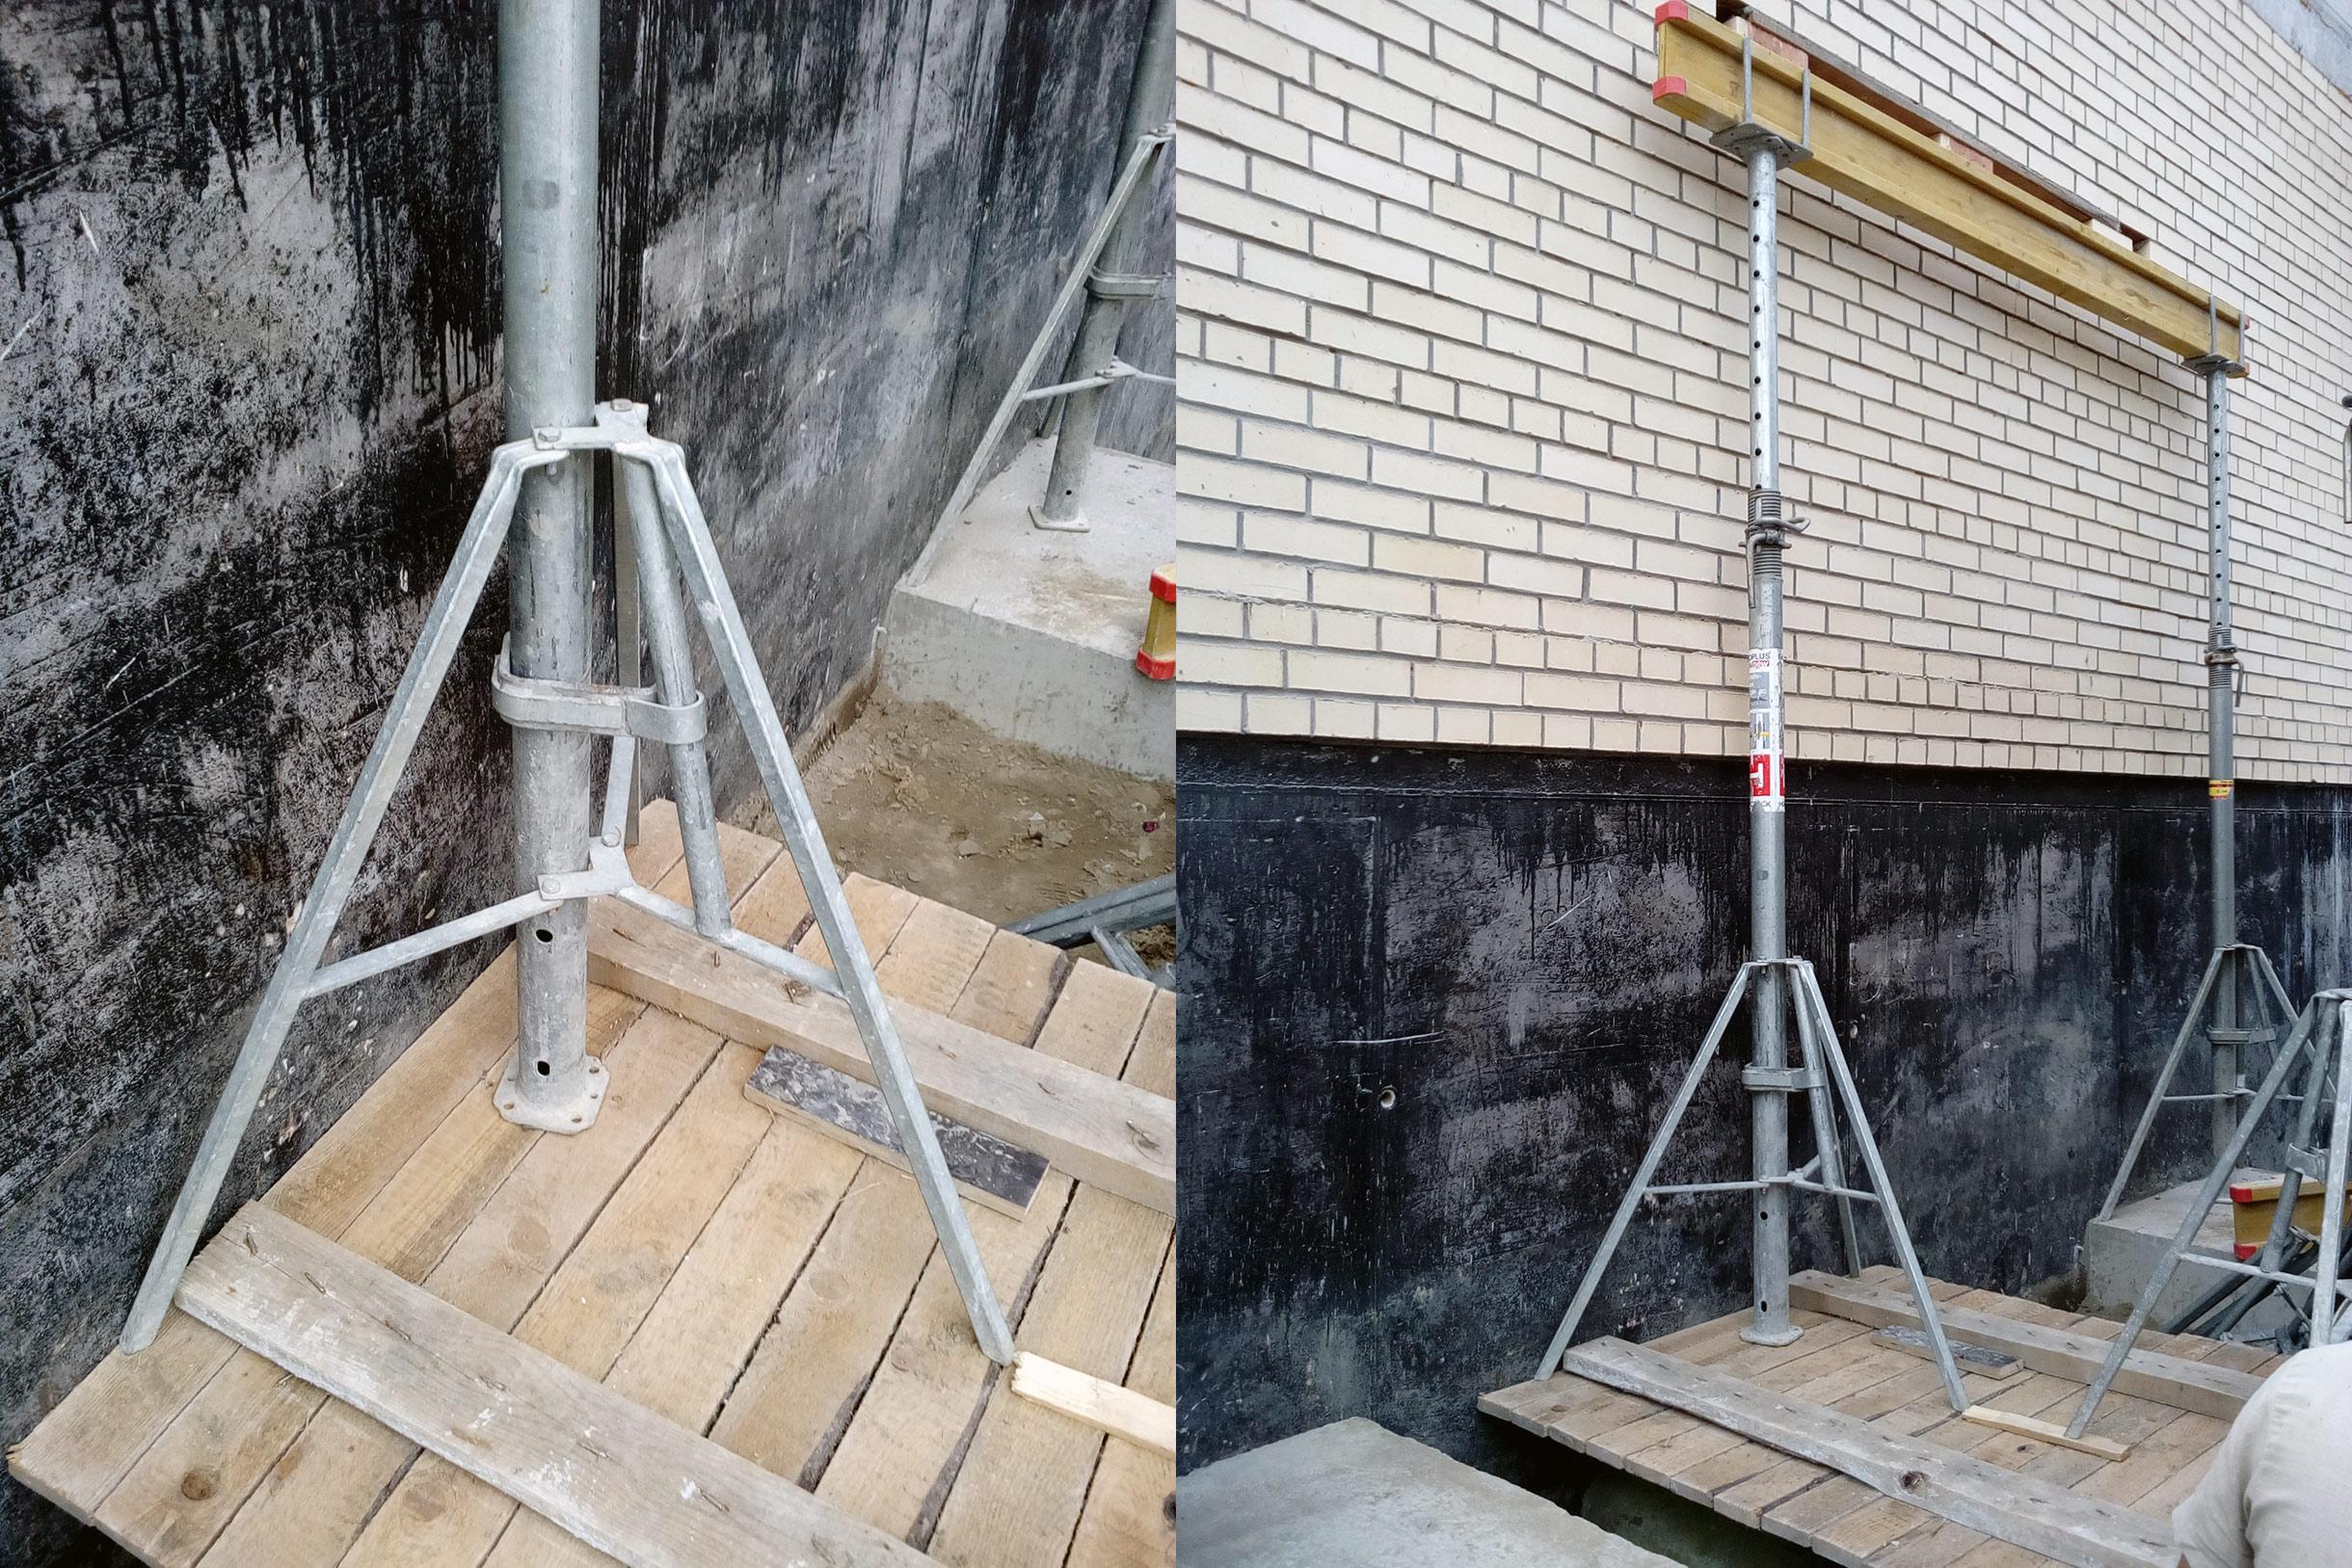 установка опалубки под лестничную площадку